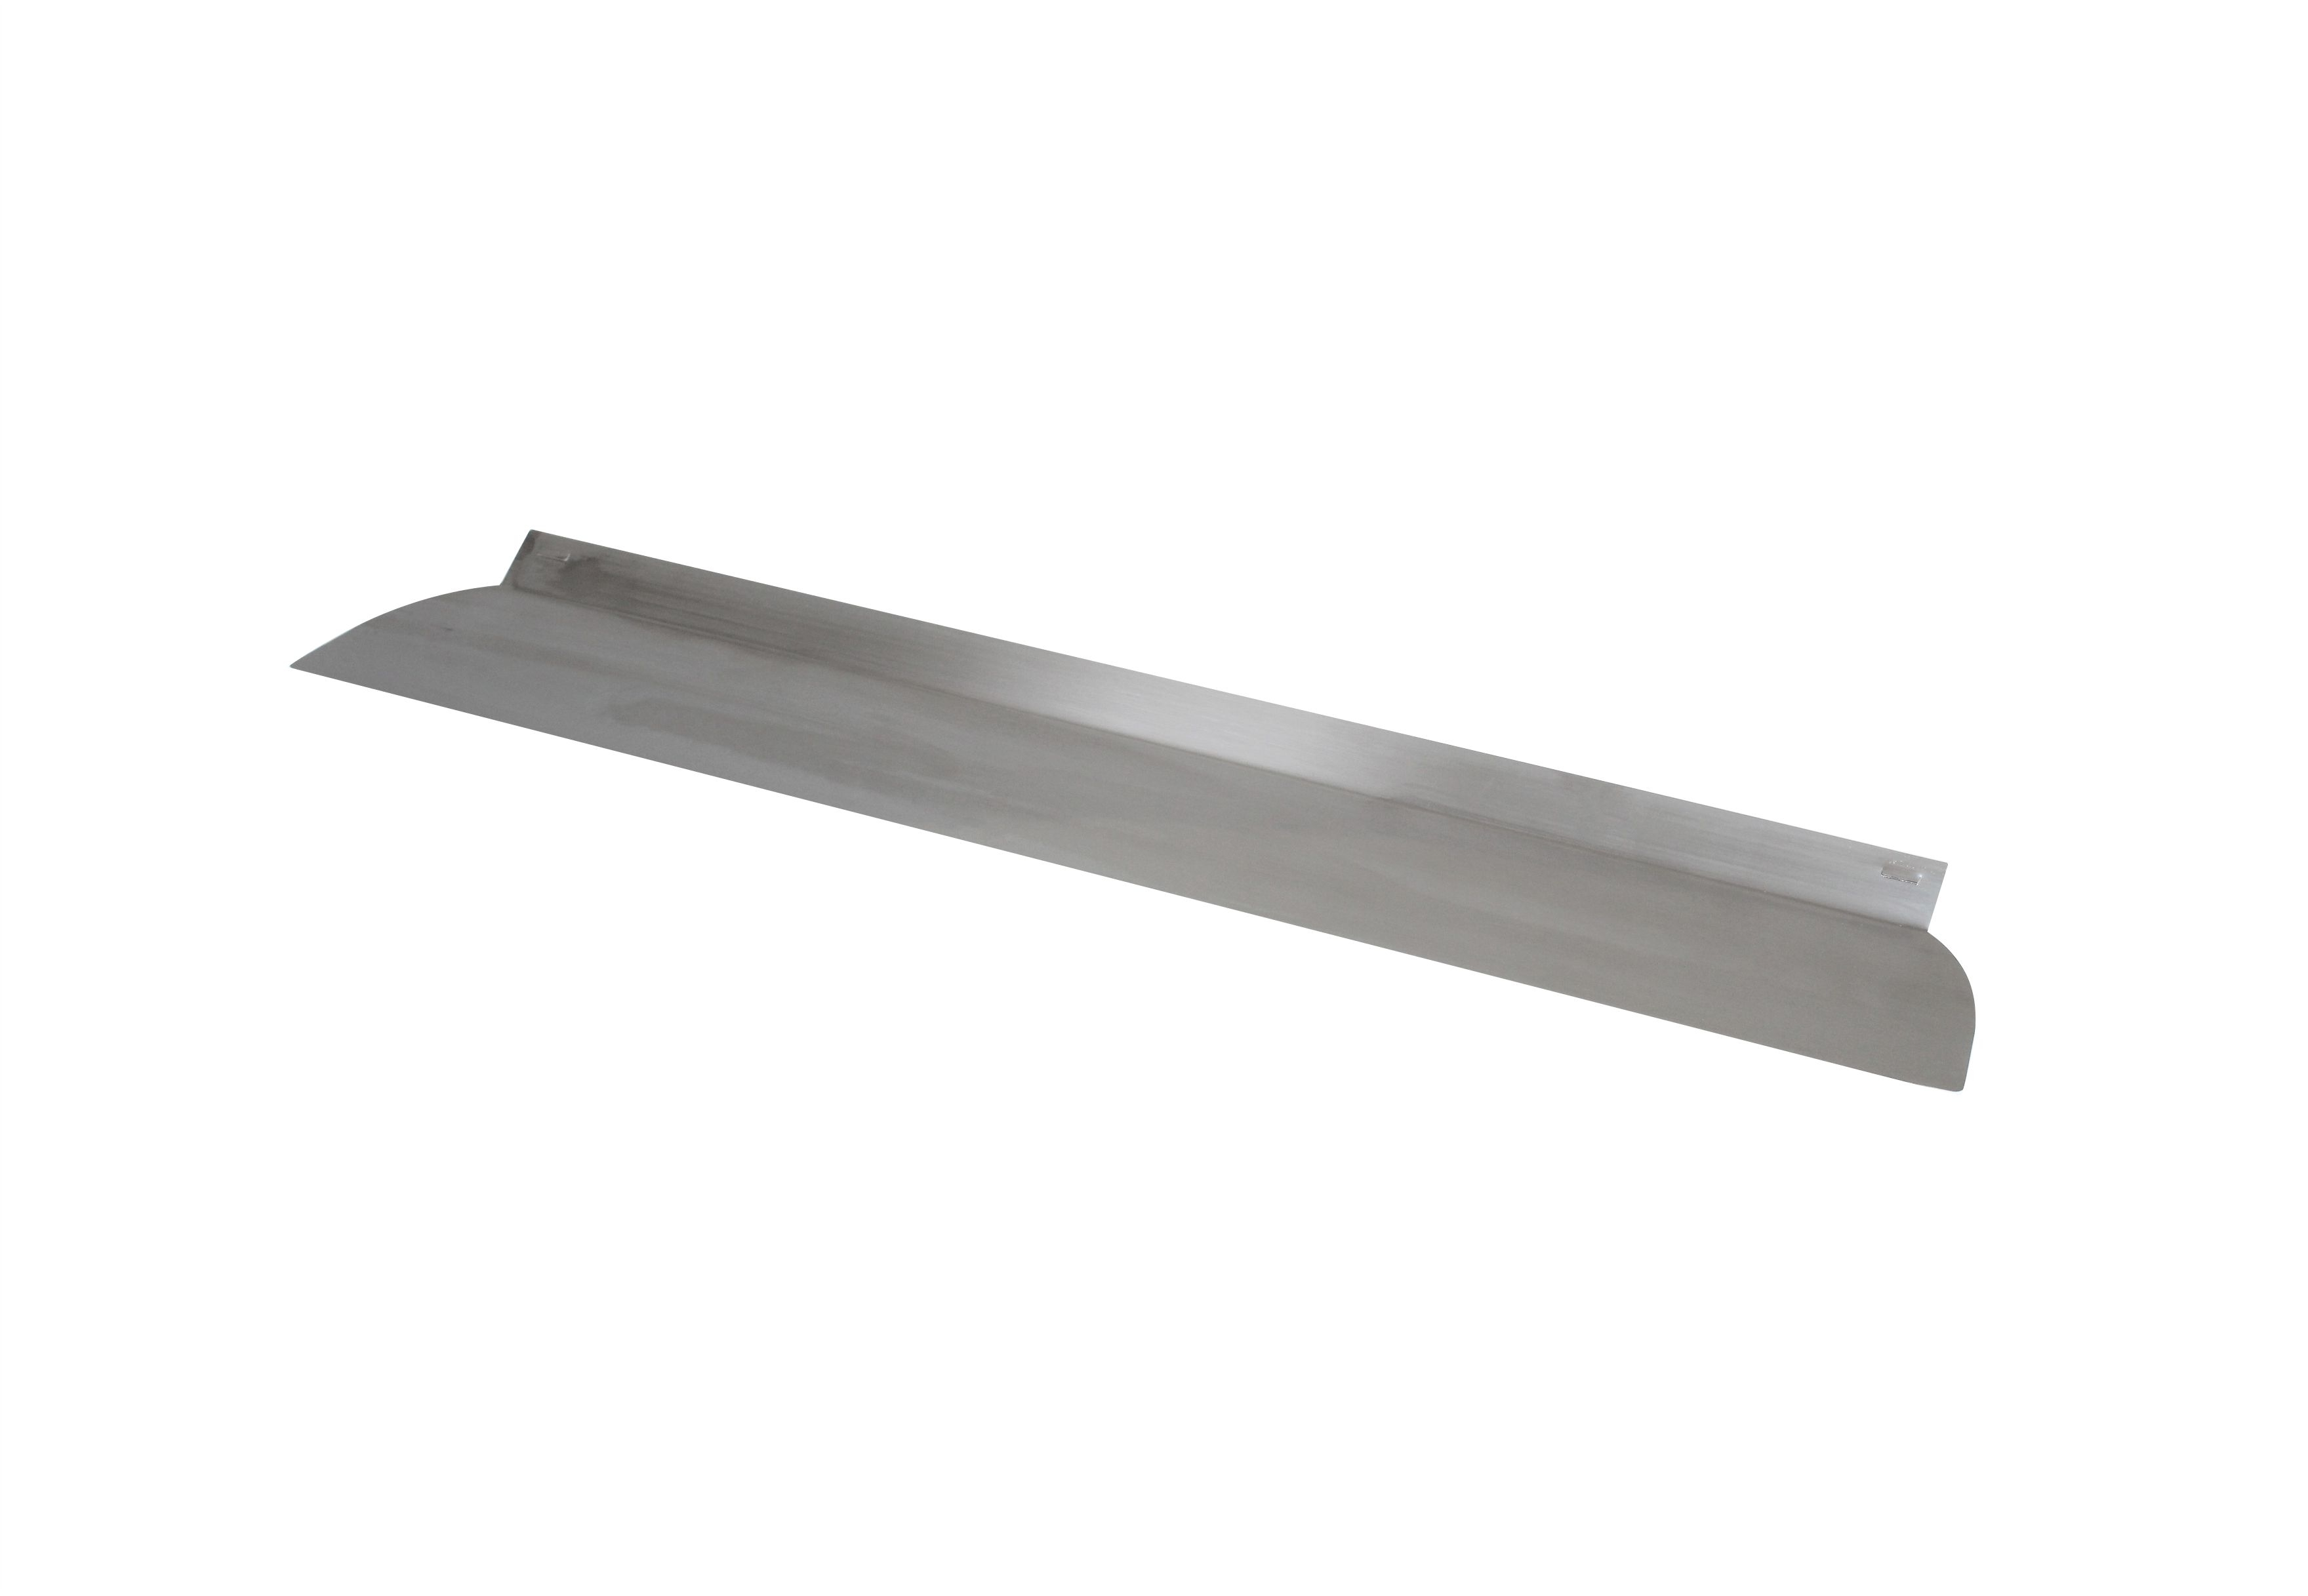 Ersatzblatt zu Profi-Flex-Spachtel 1000 mm ( Nr. 0629 )